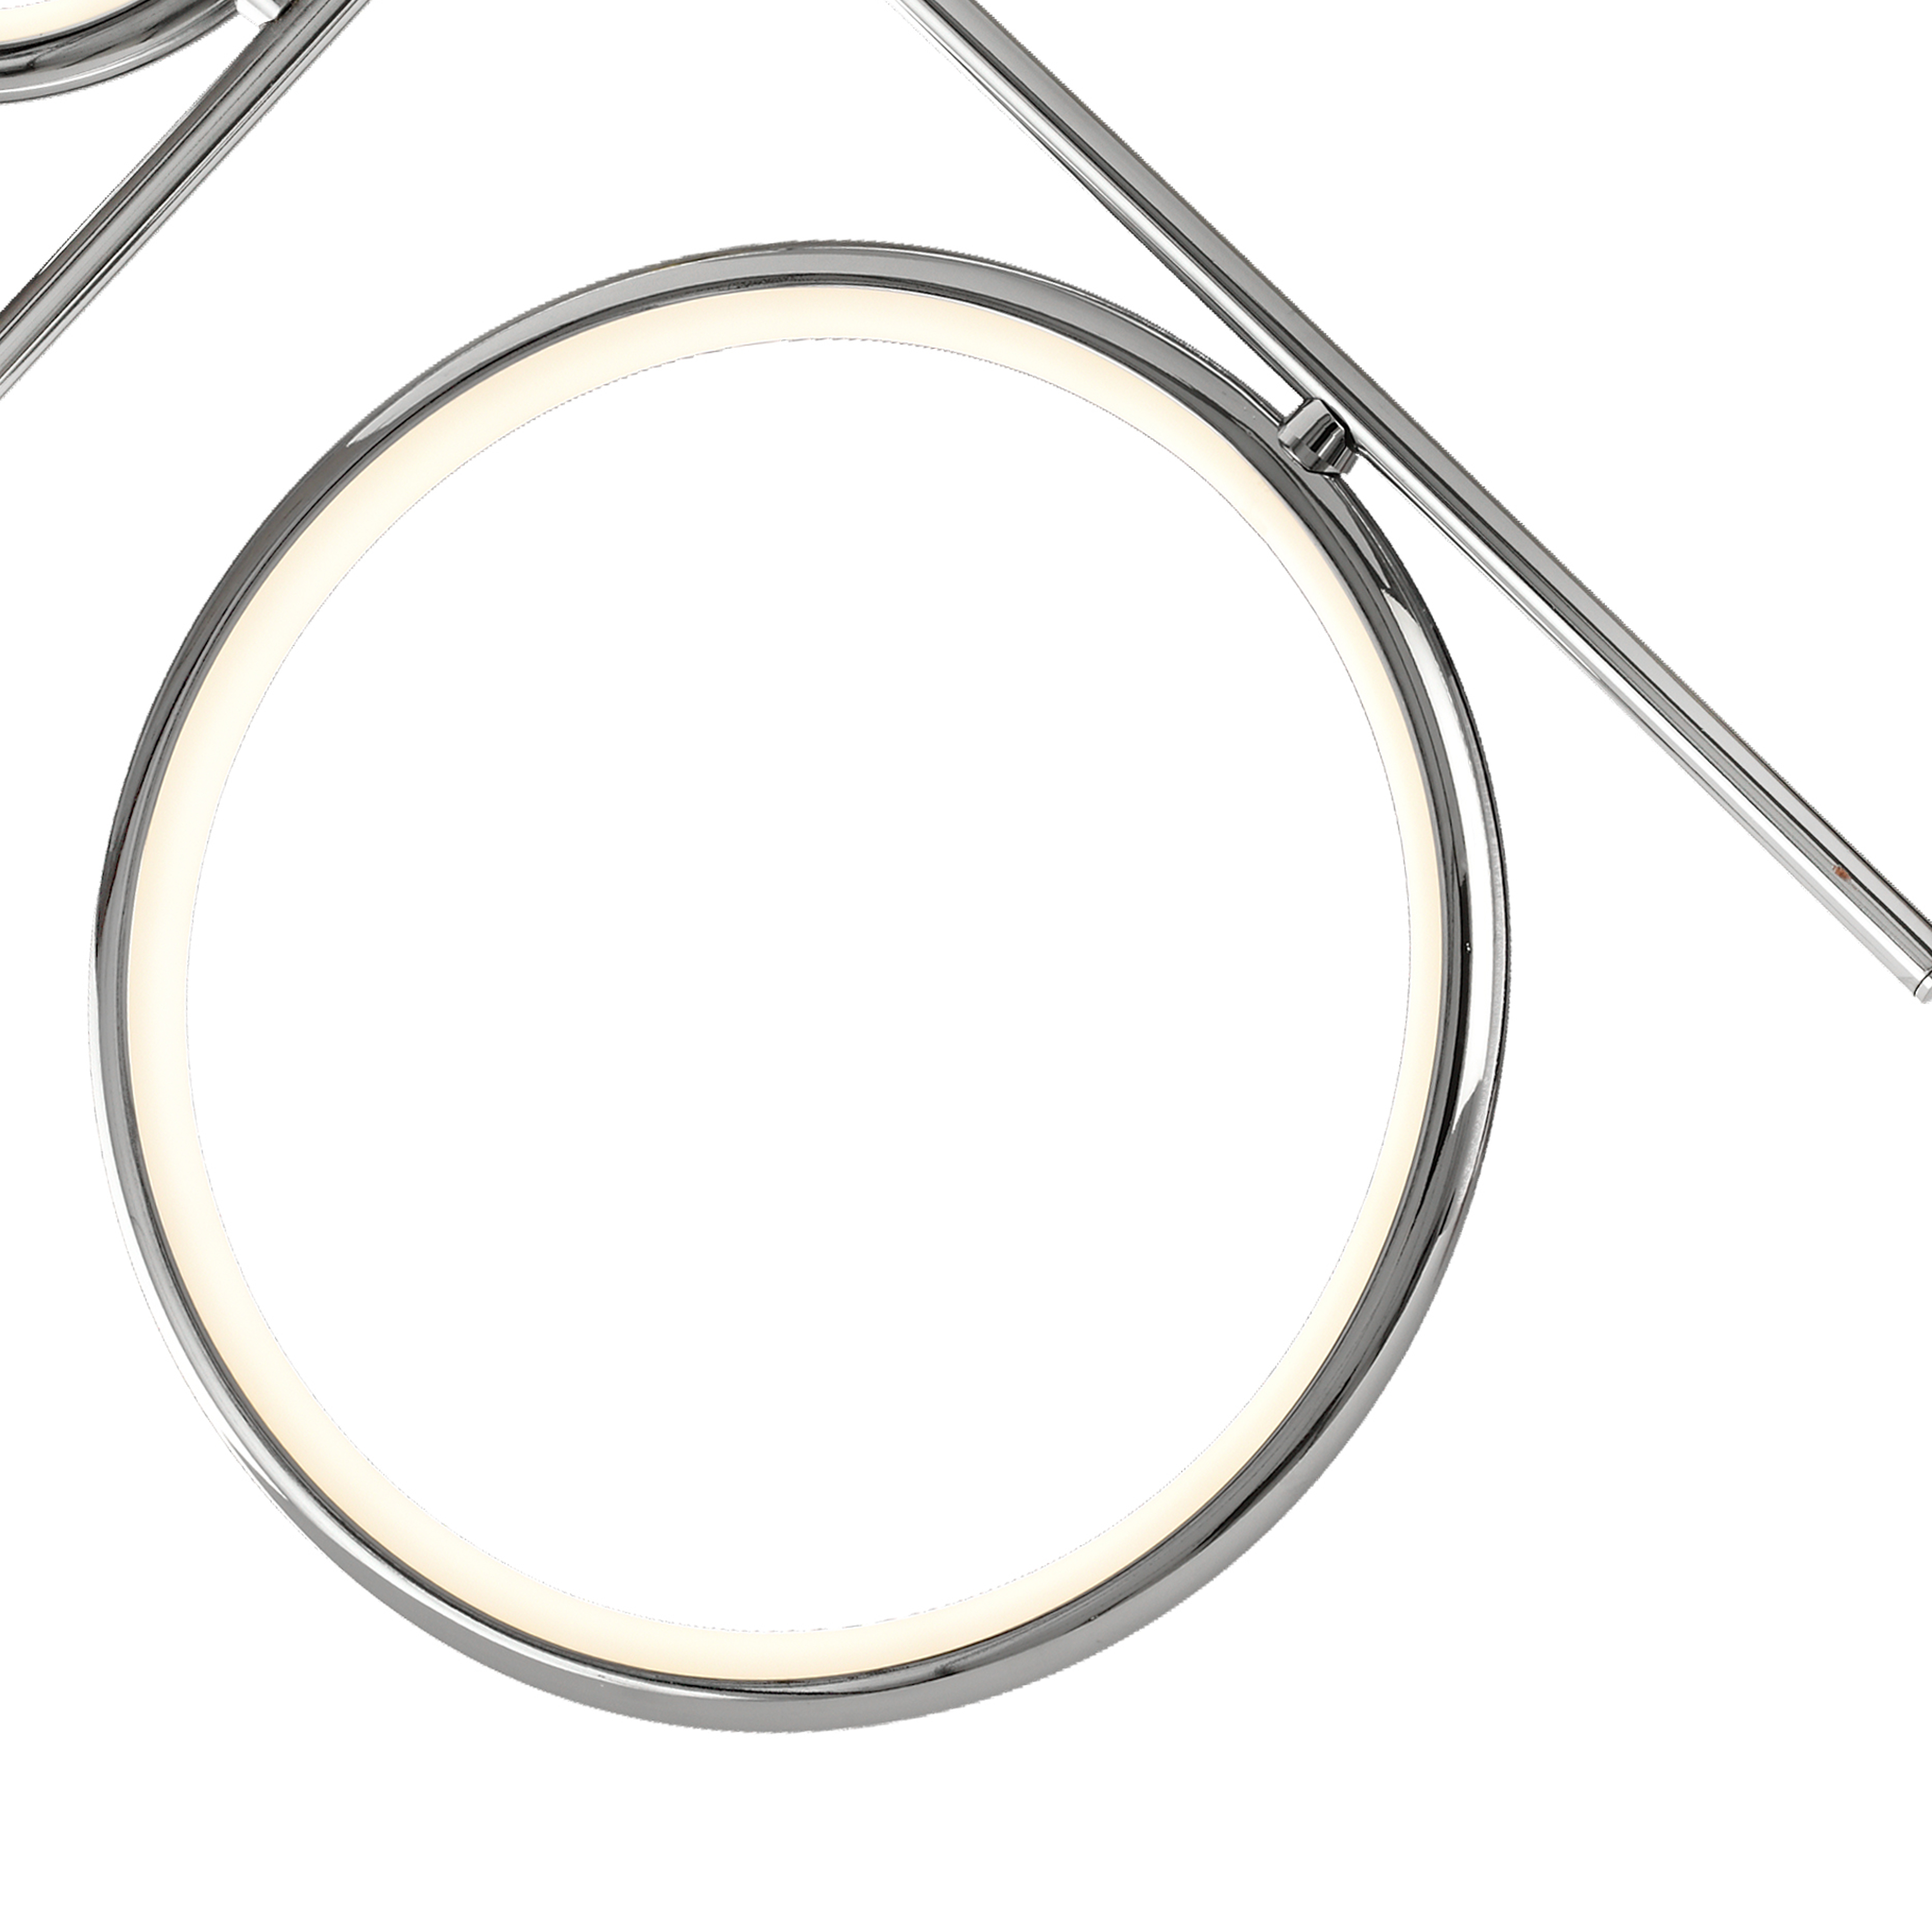 Потолочная люстра Mantra Olimpia 6591, хром, белый, металл, пластик - фото 2